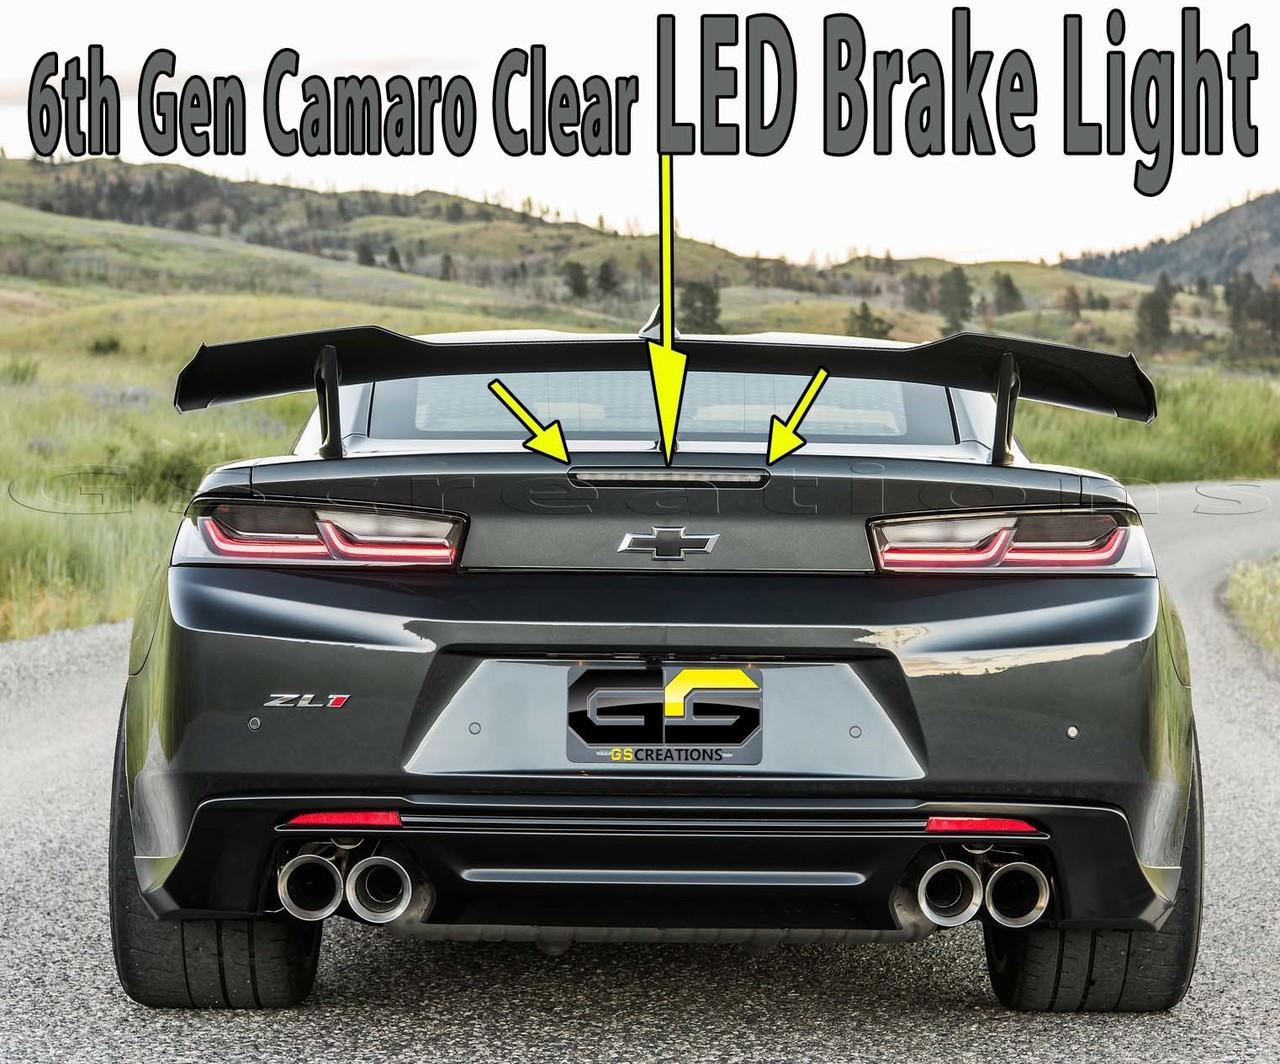 6Th Gen Camaro >> Zl1 1le 6th Gen Camaro Smoked Led Brake Light Gscreations